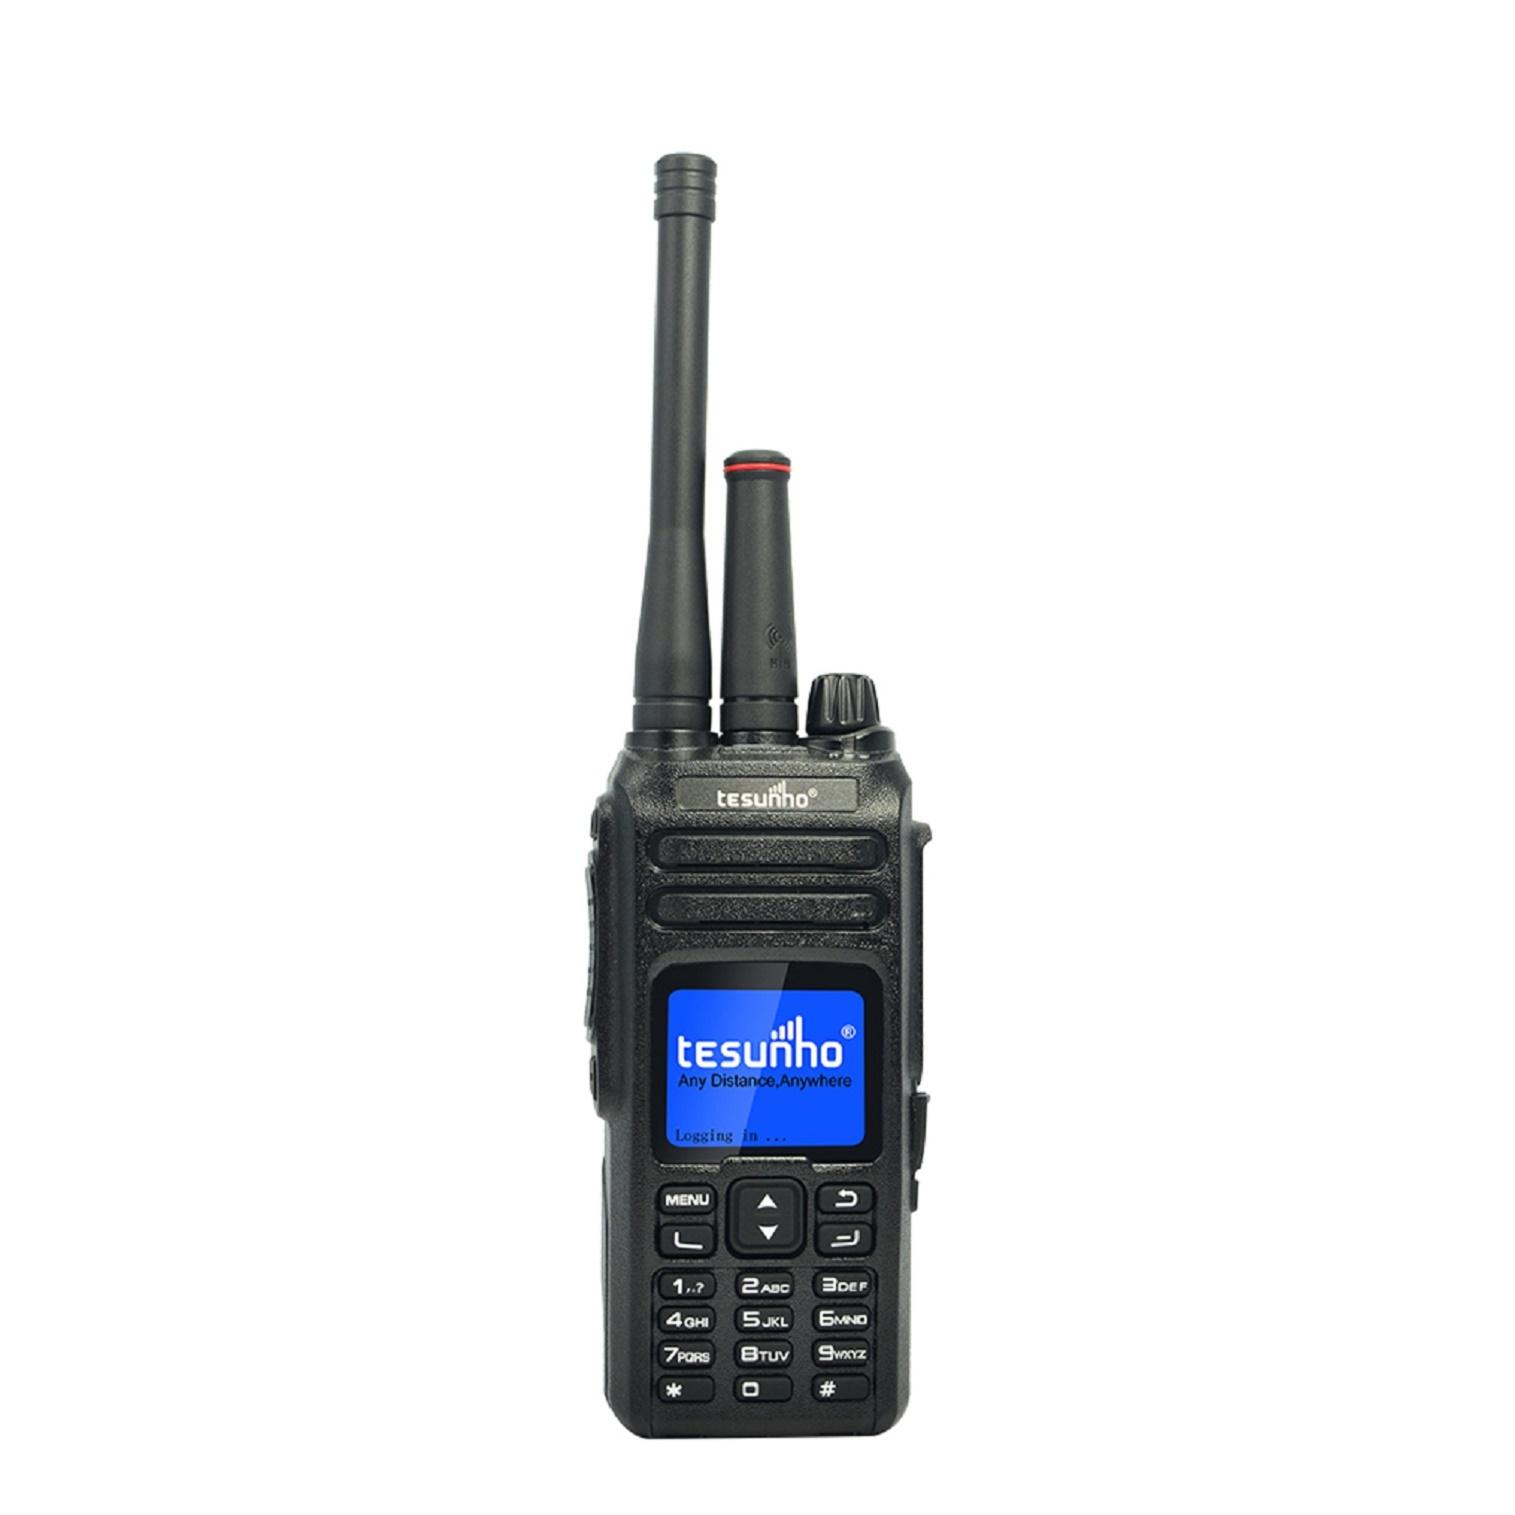 Gateway Walkie Talkie Combined 3G VHF/UHF Analog POC Radio TH-680